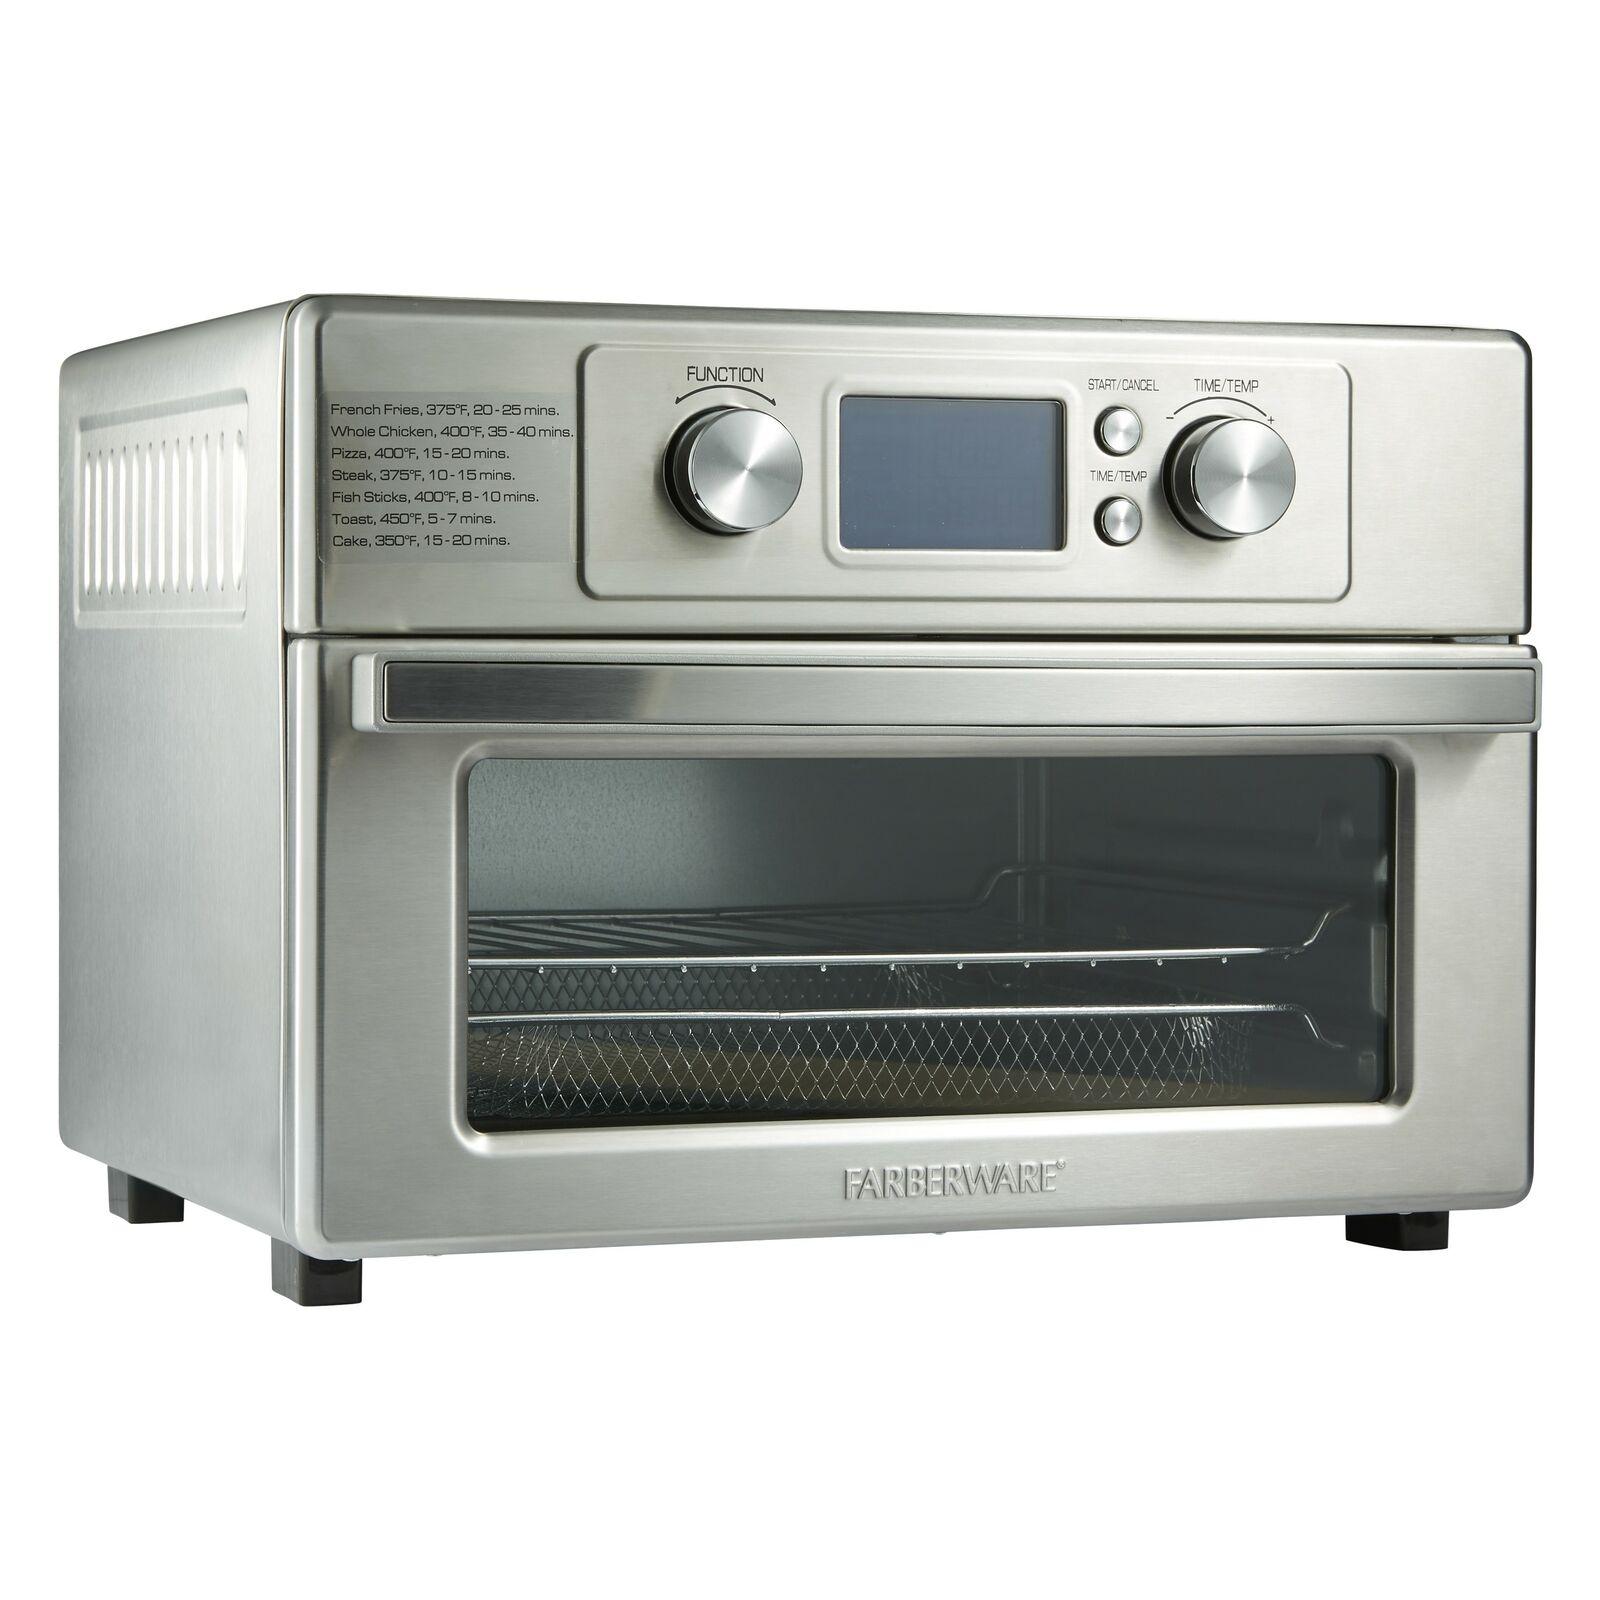 Farberware- Air Fryer Toaster Oven - Stainless Steel- Brand